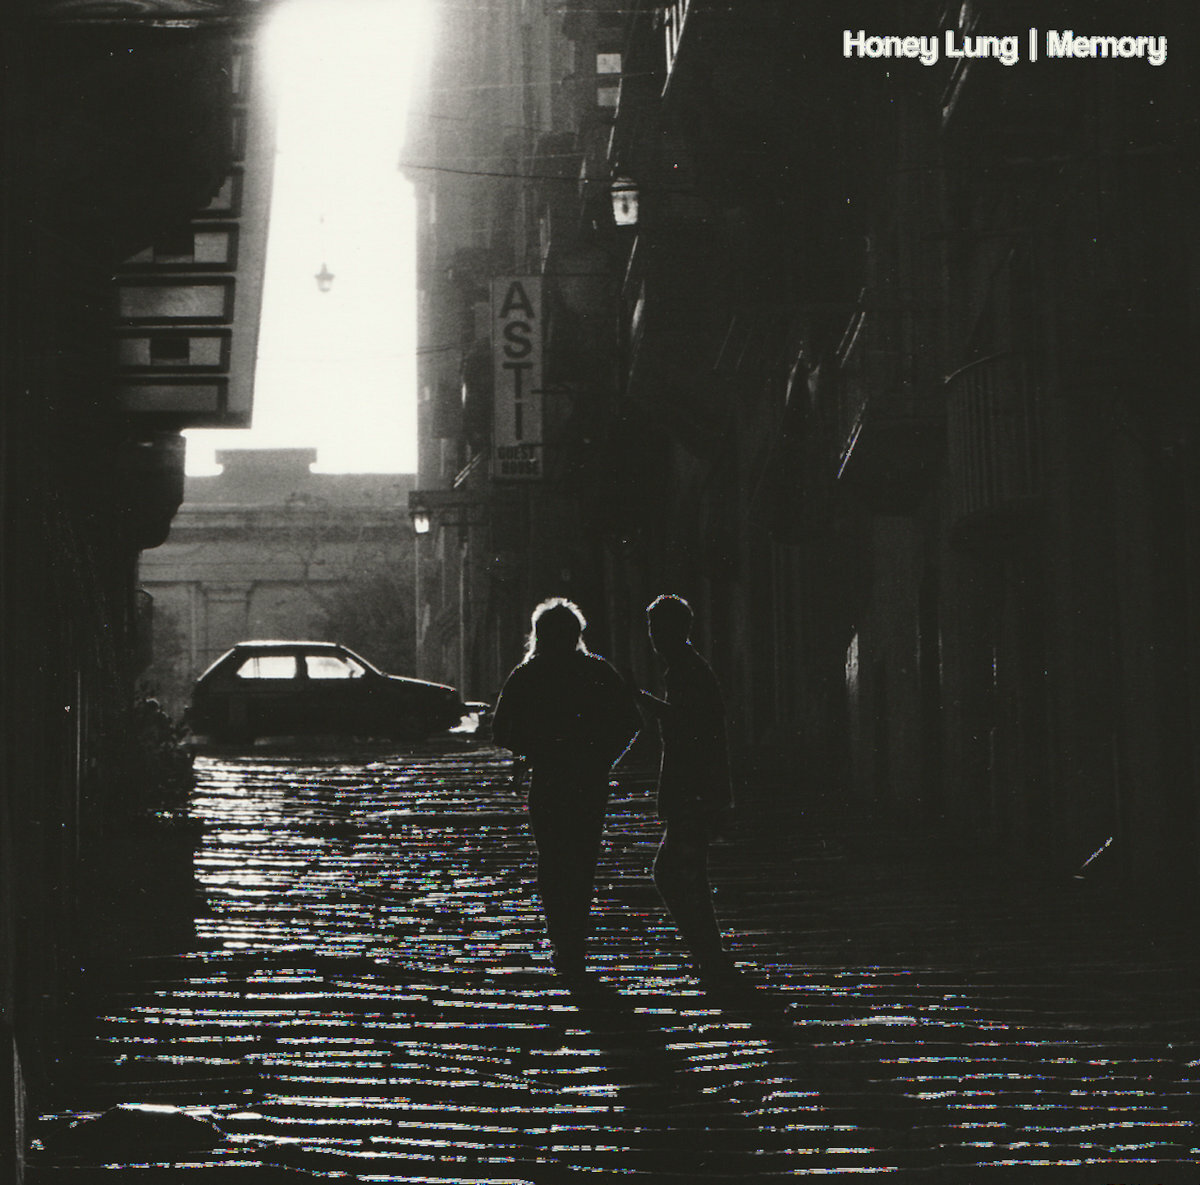 Honey Lung / Memory(500 Ltd LP)